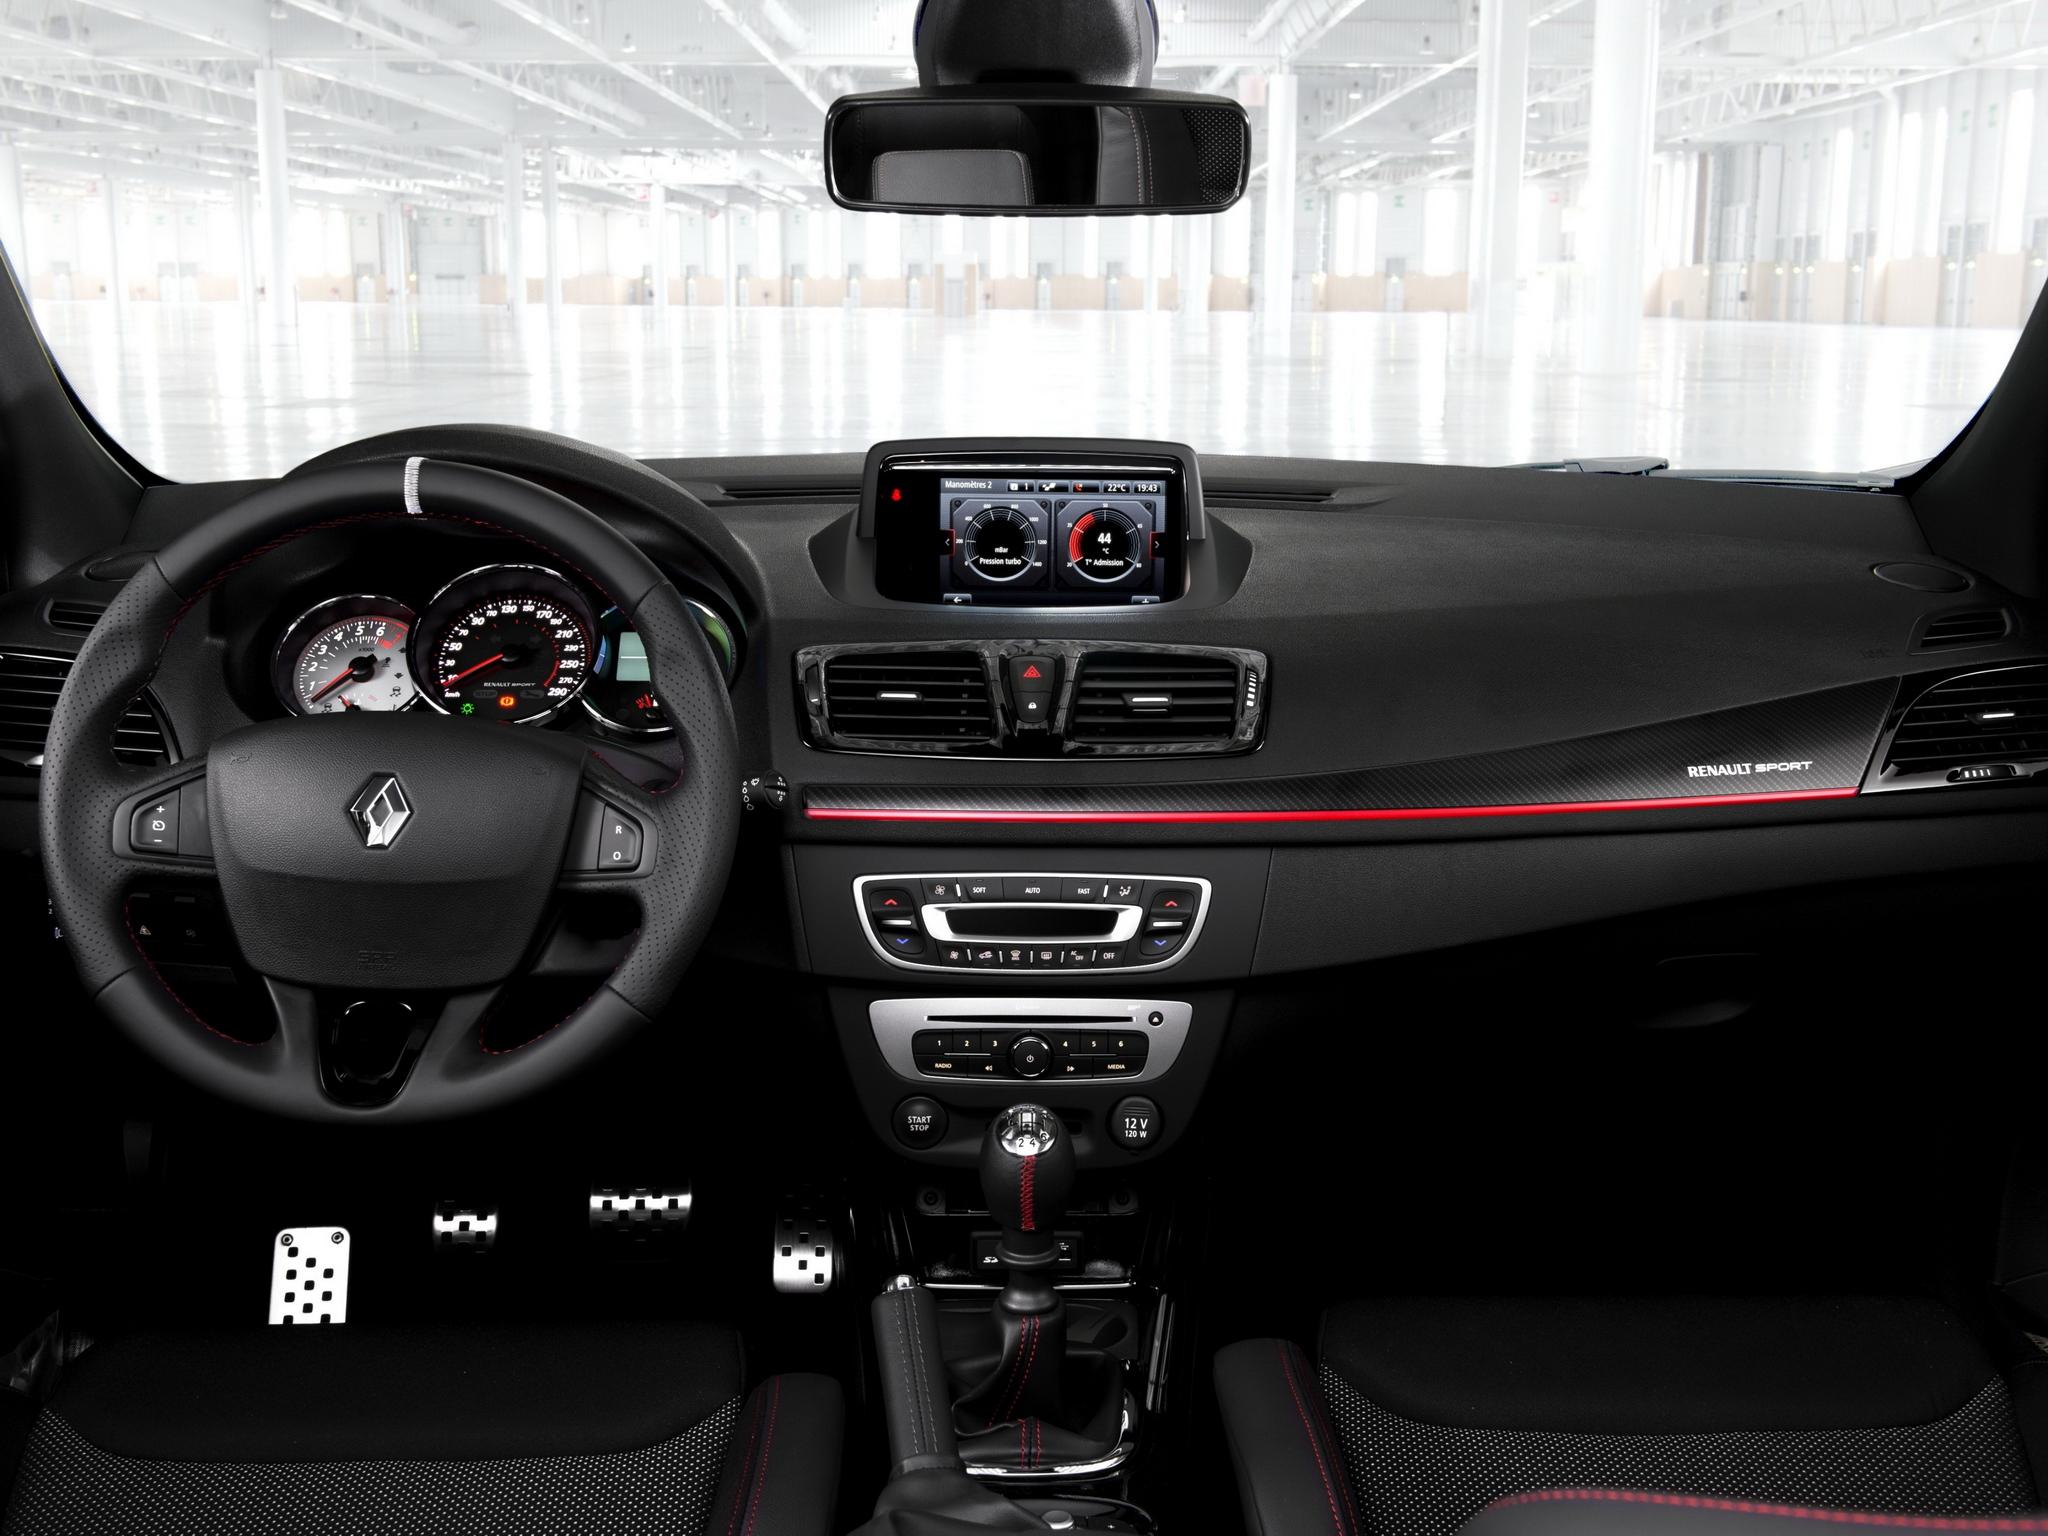 Renault Megane Interior 2014 2014 Renault Megane r s 265